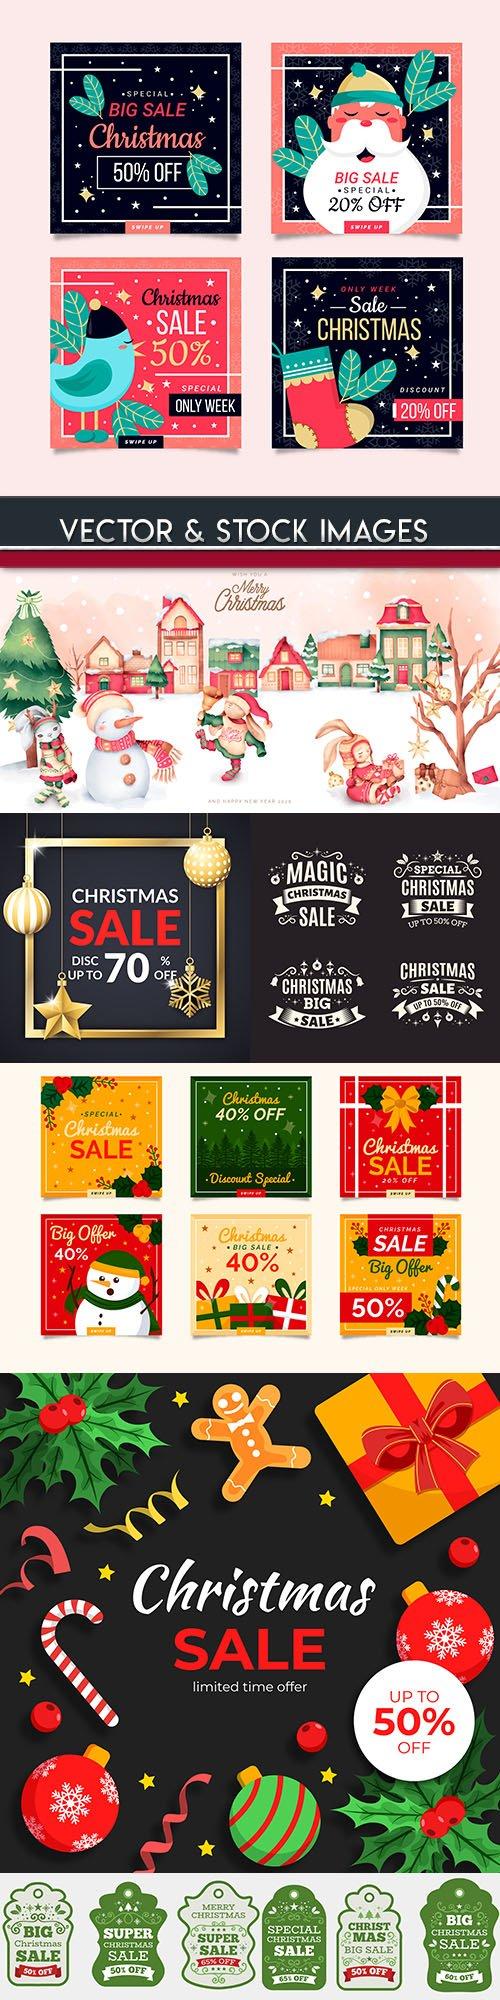 Merry Christmas sale 2020 decorative design